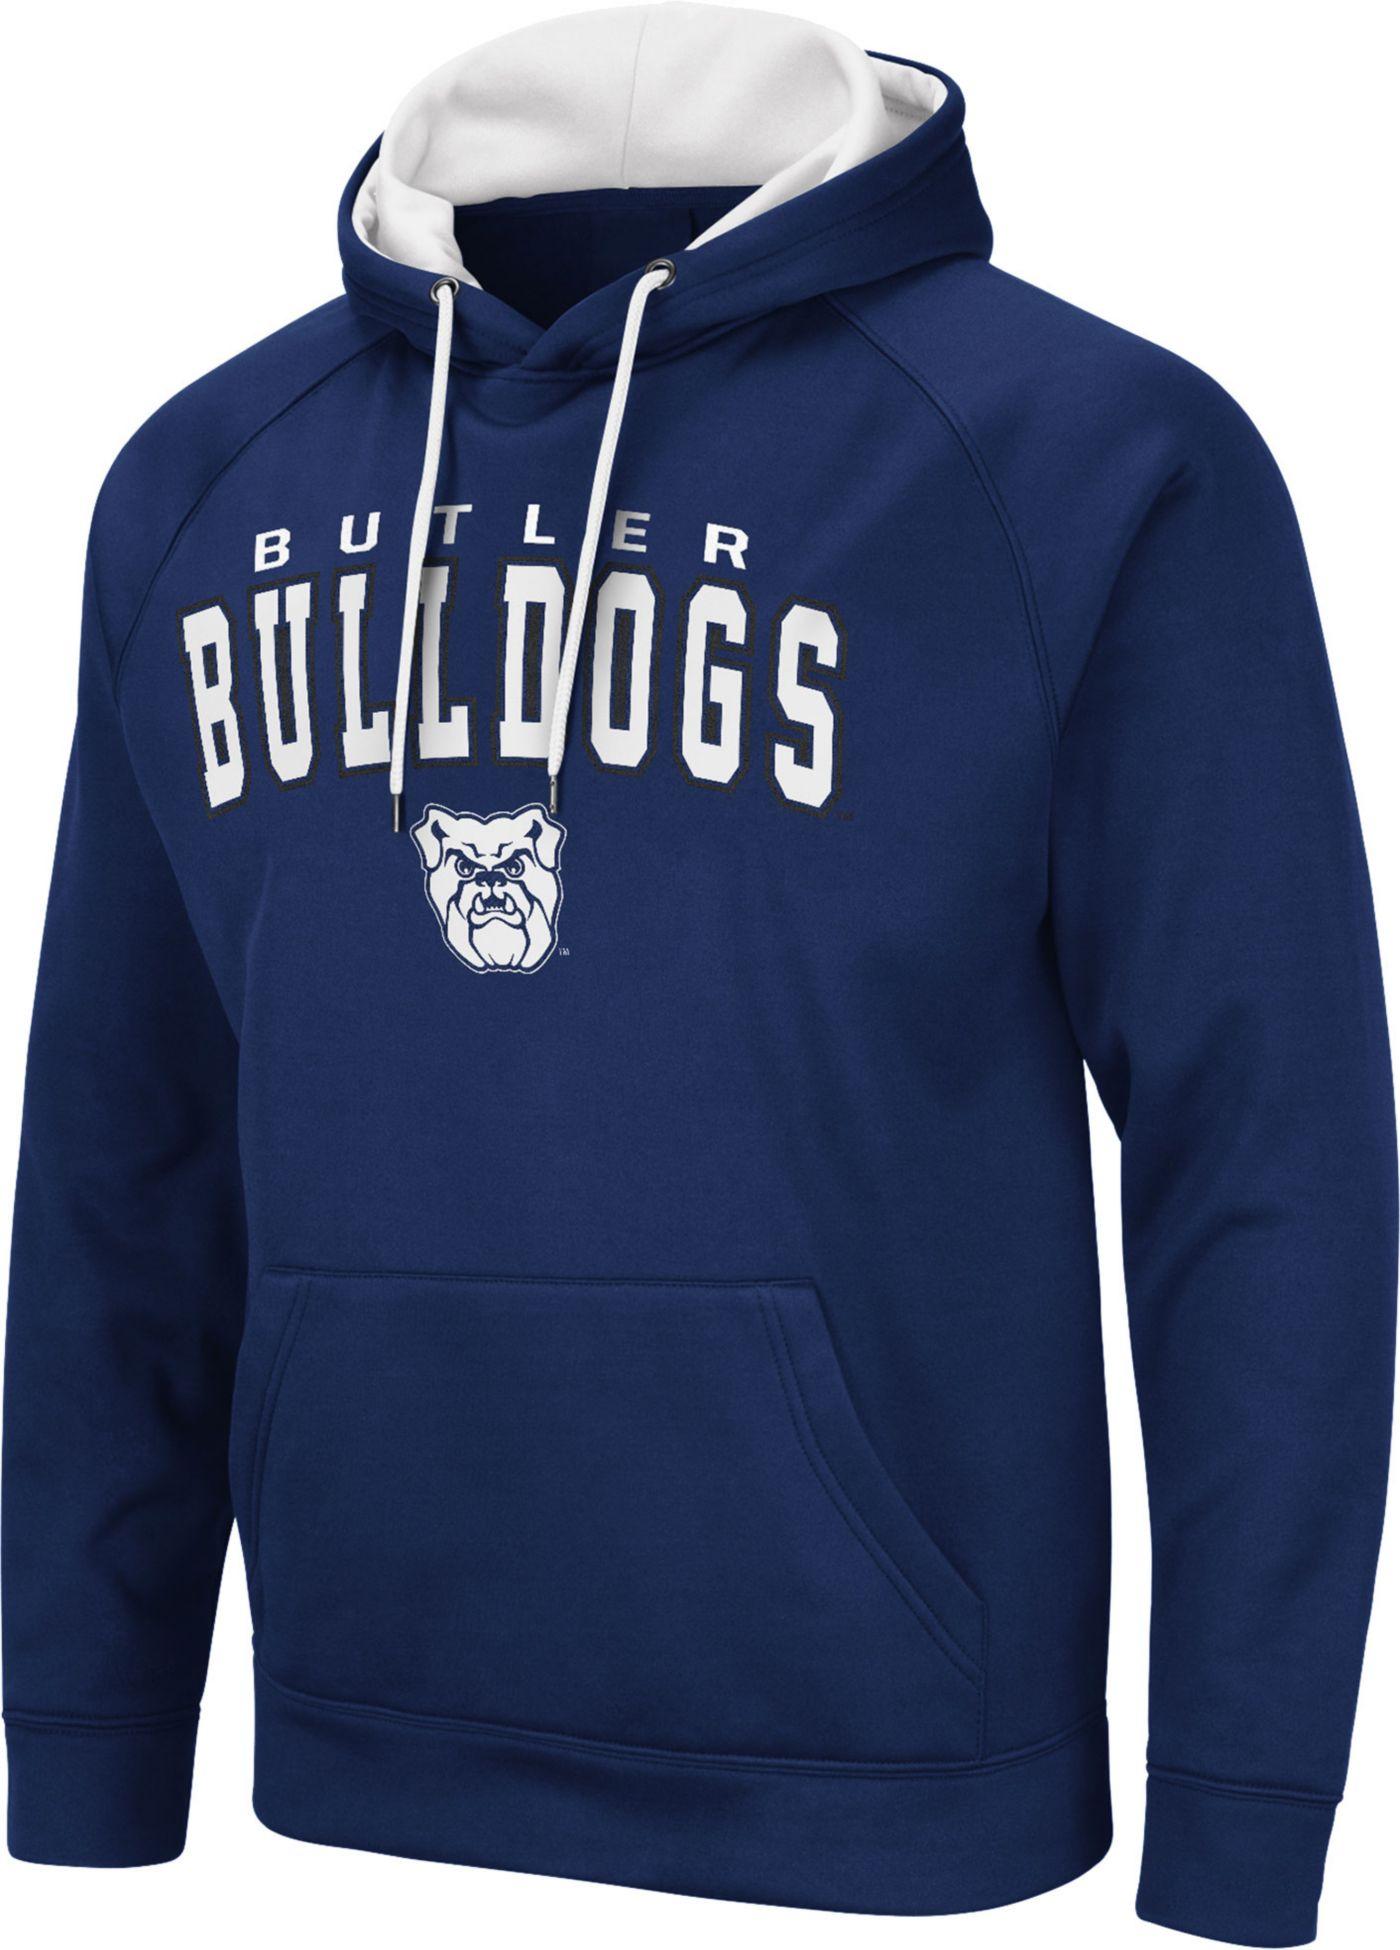 Colosseum Men's Butler Bulldogs Blue Pullover Hoodie